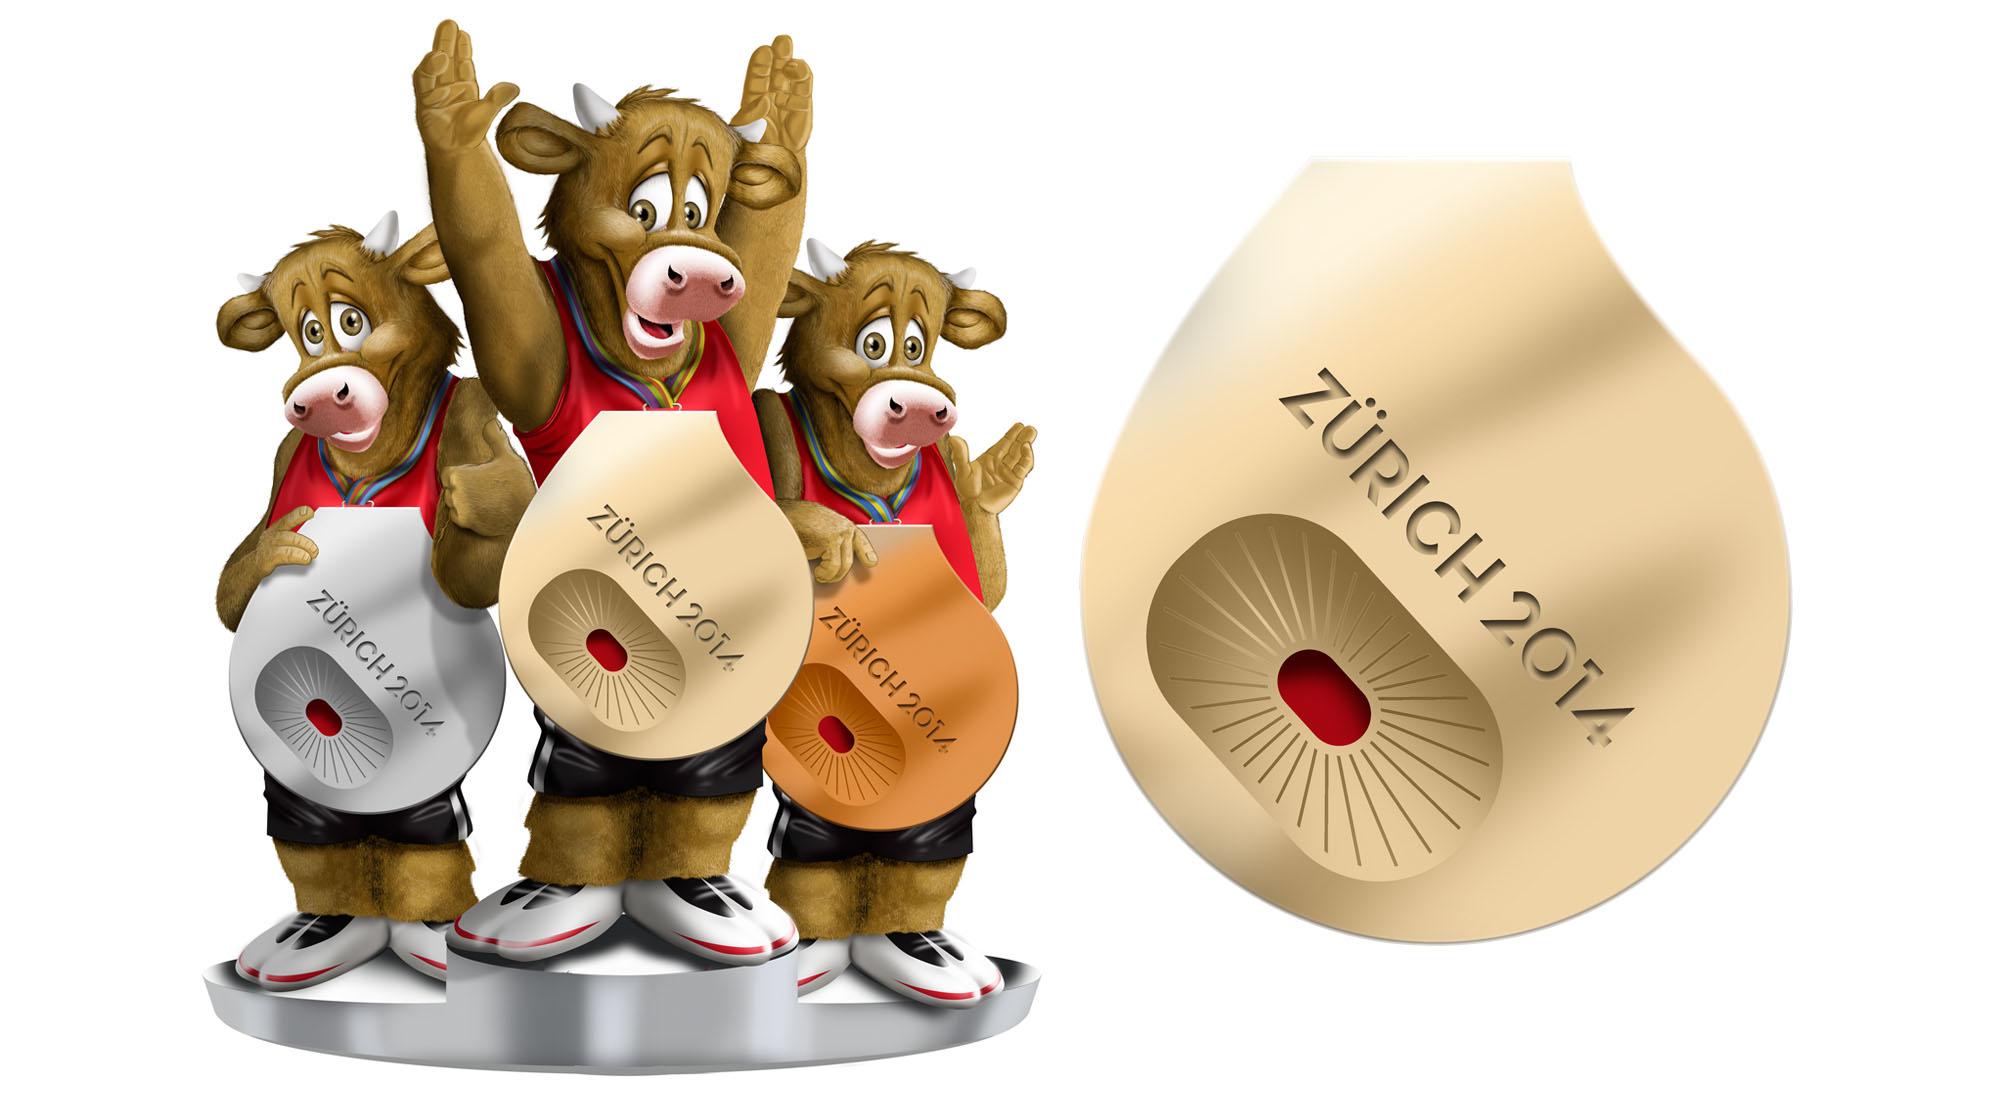 Hard Set Graphics for BBC Sport European Athletics Championships 2014